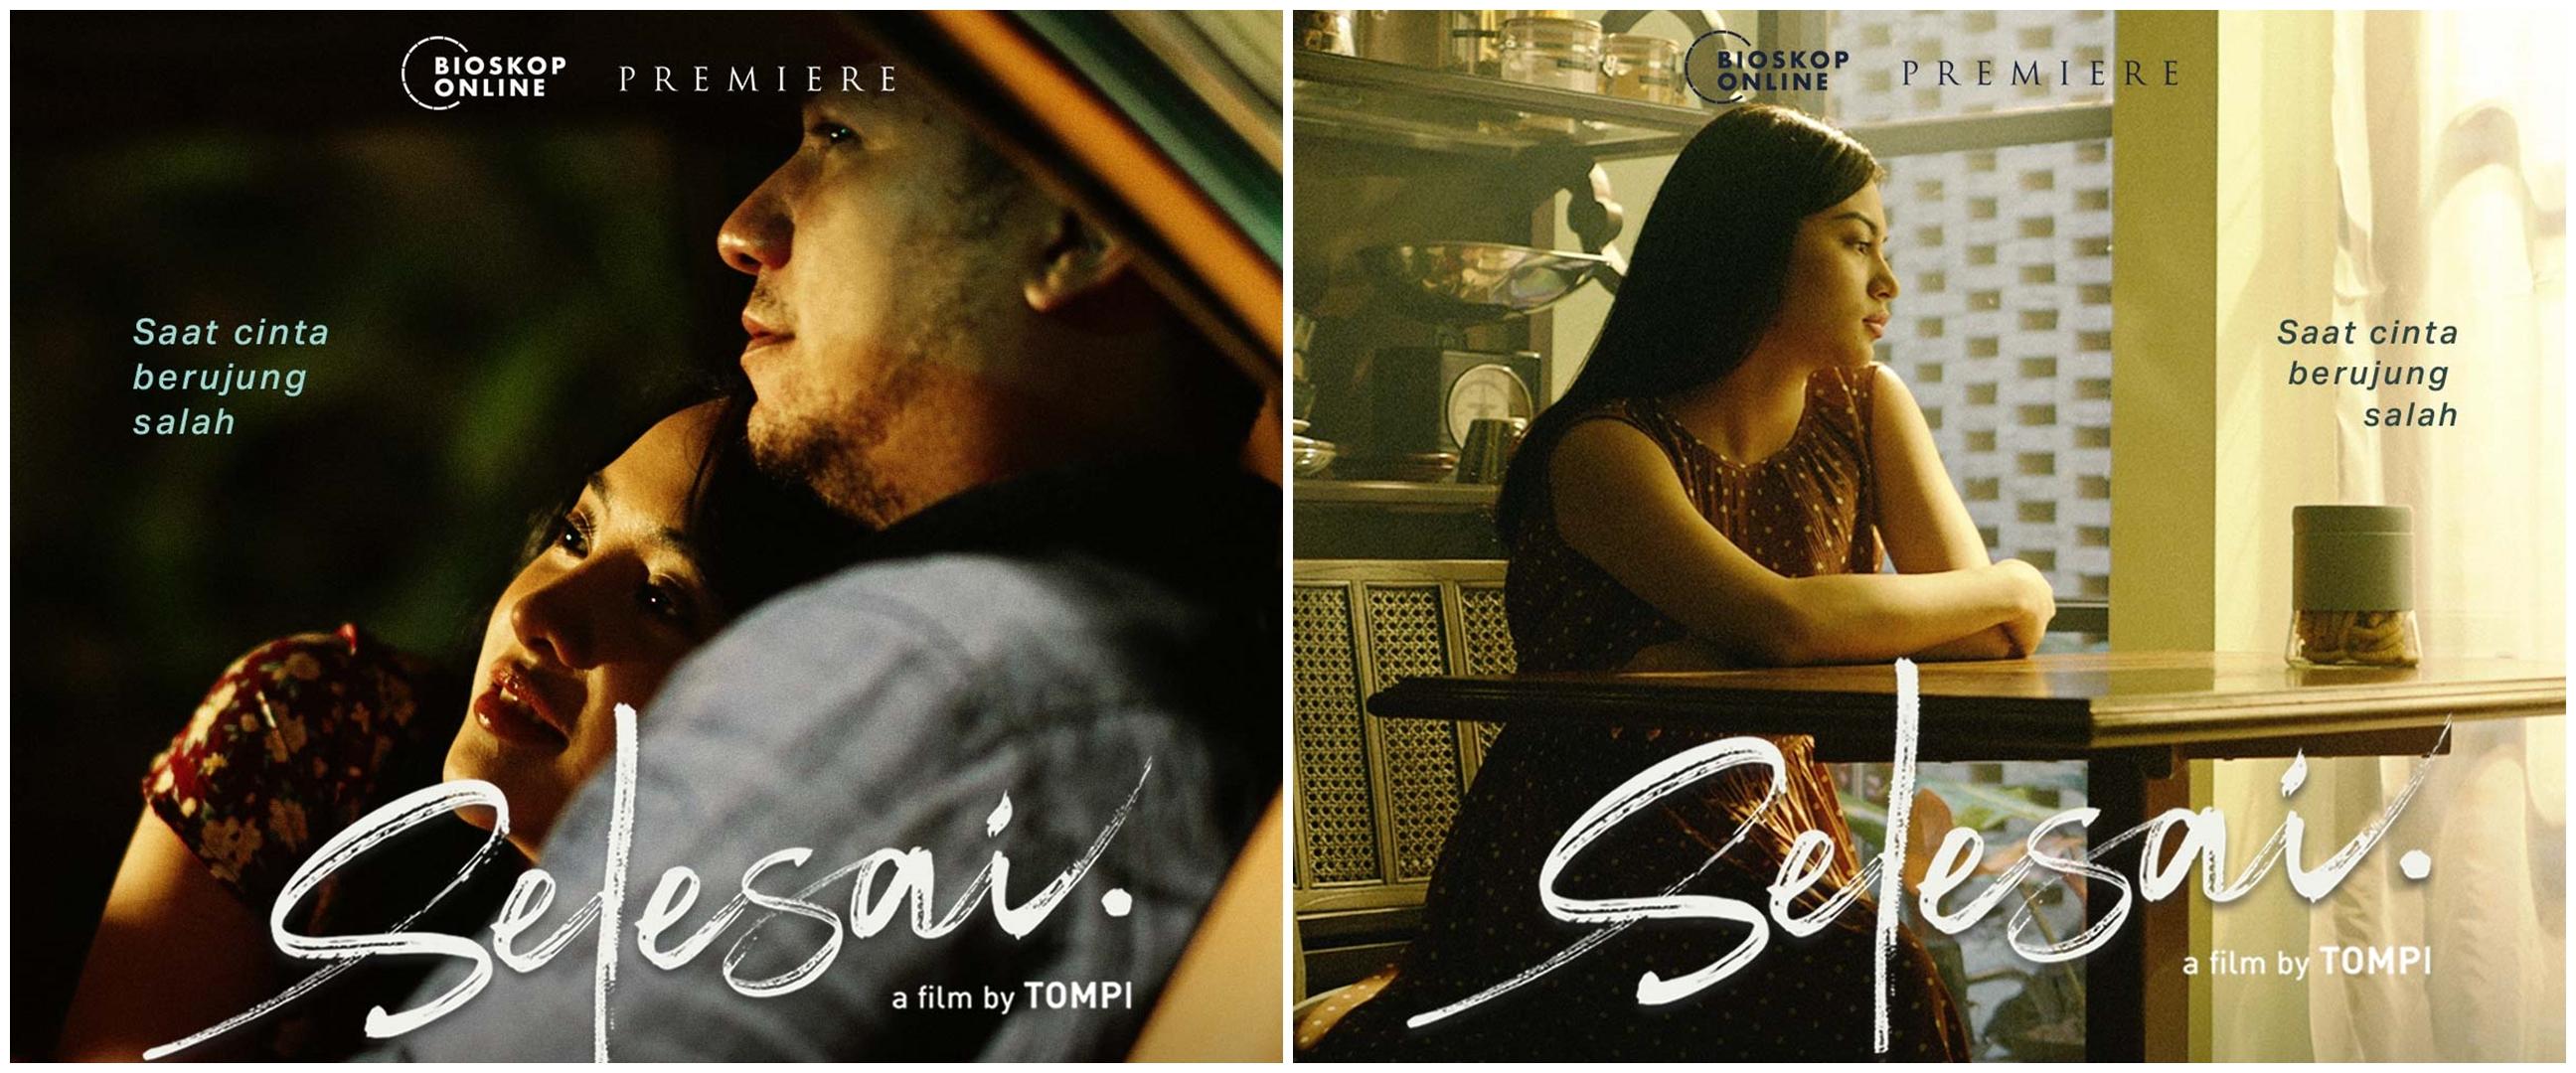 Gading & Ariel Tatum ungkap kisah syuting adegan mesra di film Selesai